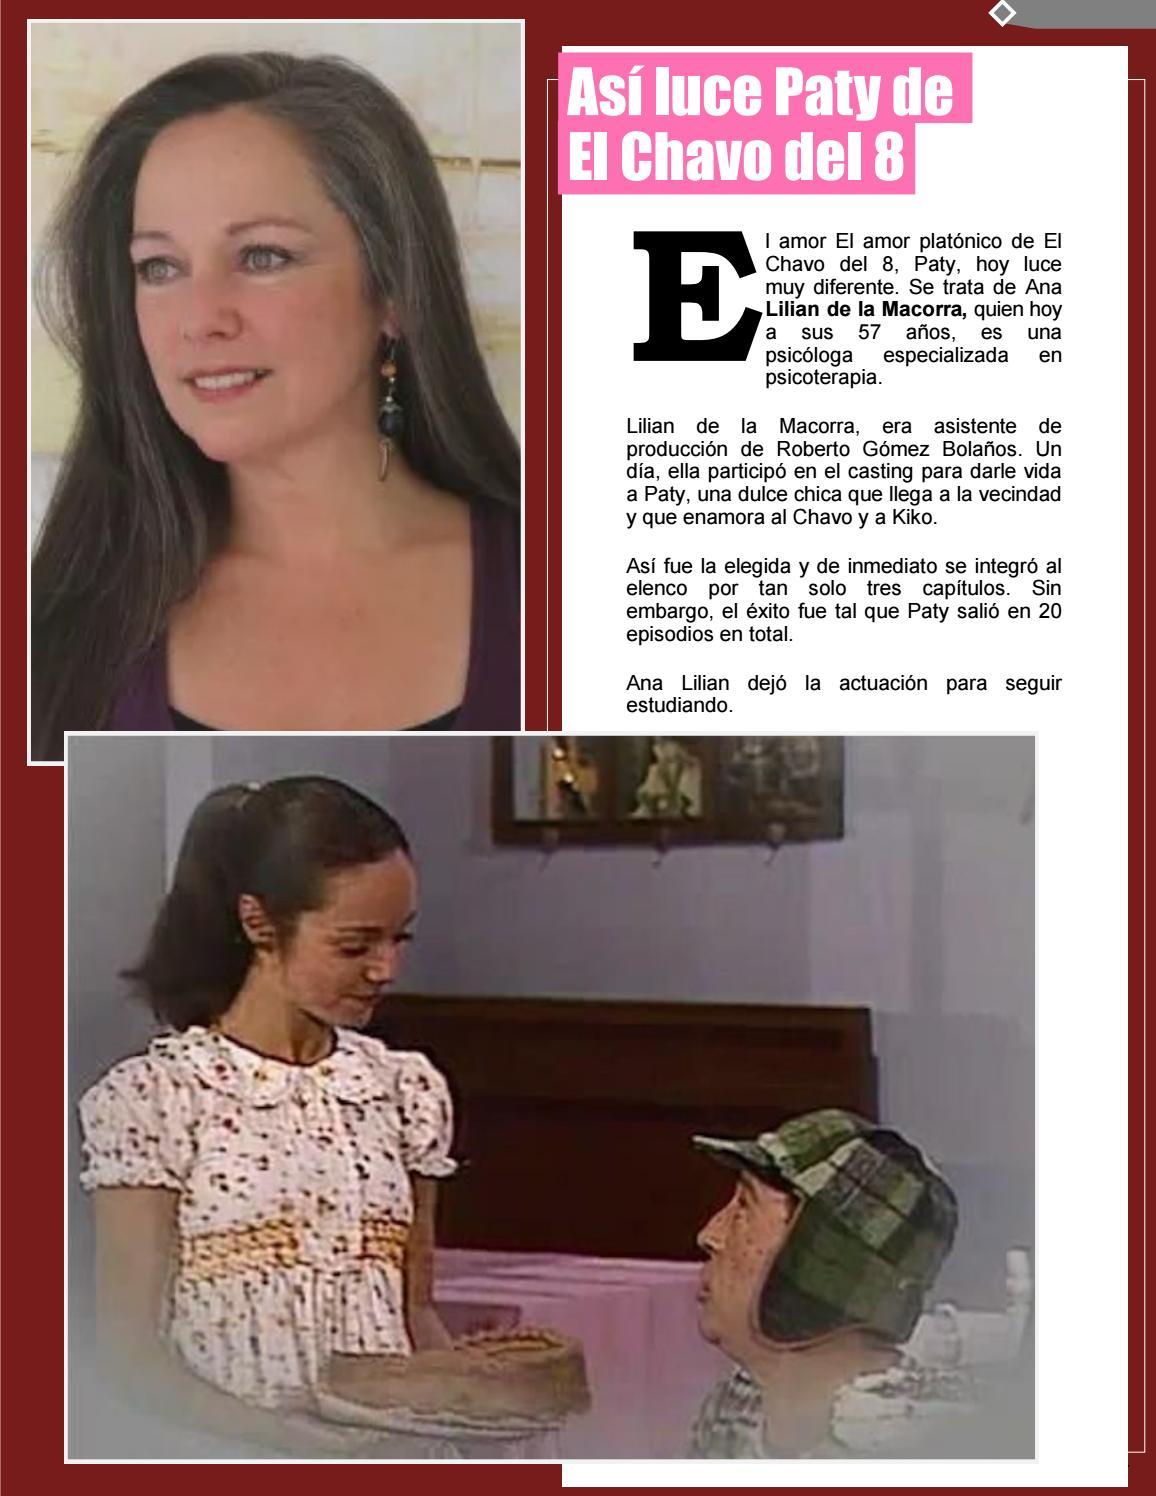 Ana Lilian De La Macorra twin melody - tveo corazon 19na edicion abril 2017rafael